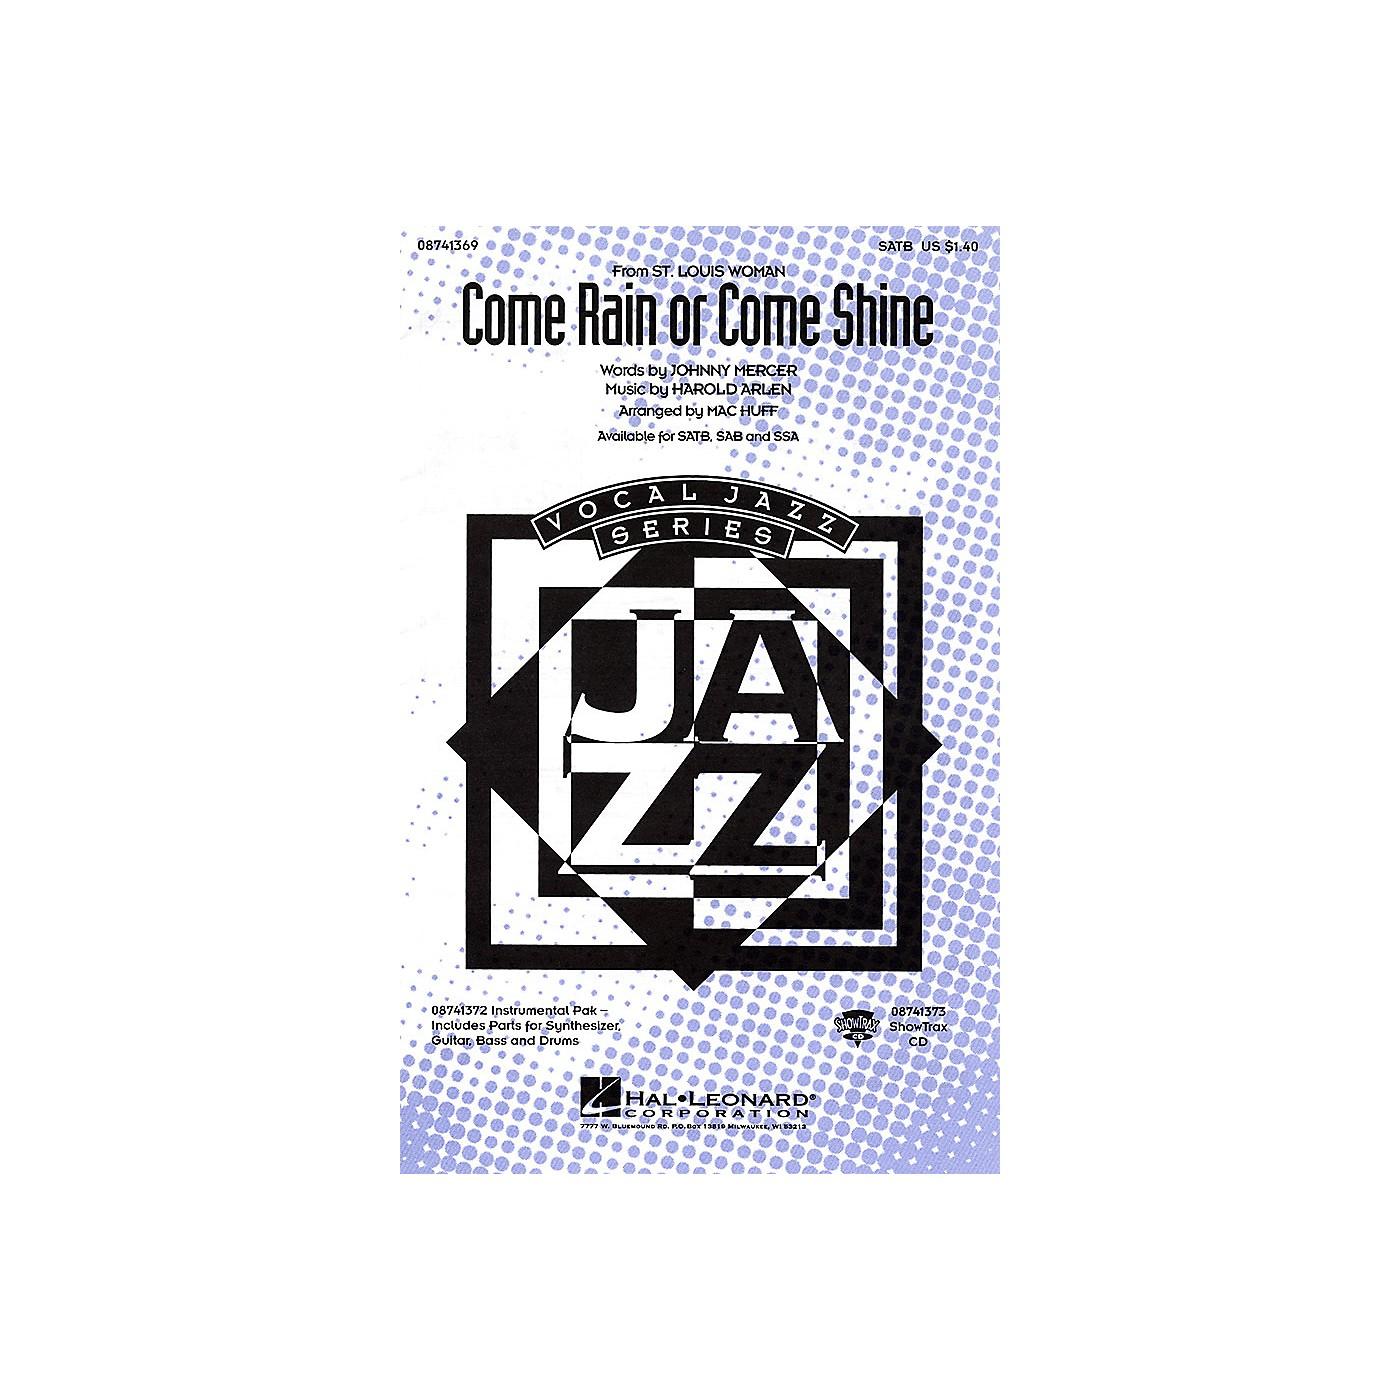 Hal Leonard Come Rain or Come Shine SATB arranged by Mac Huff thumbnail